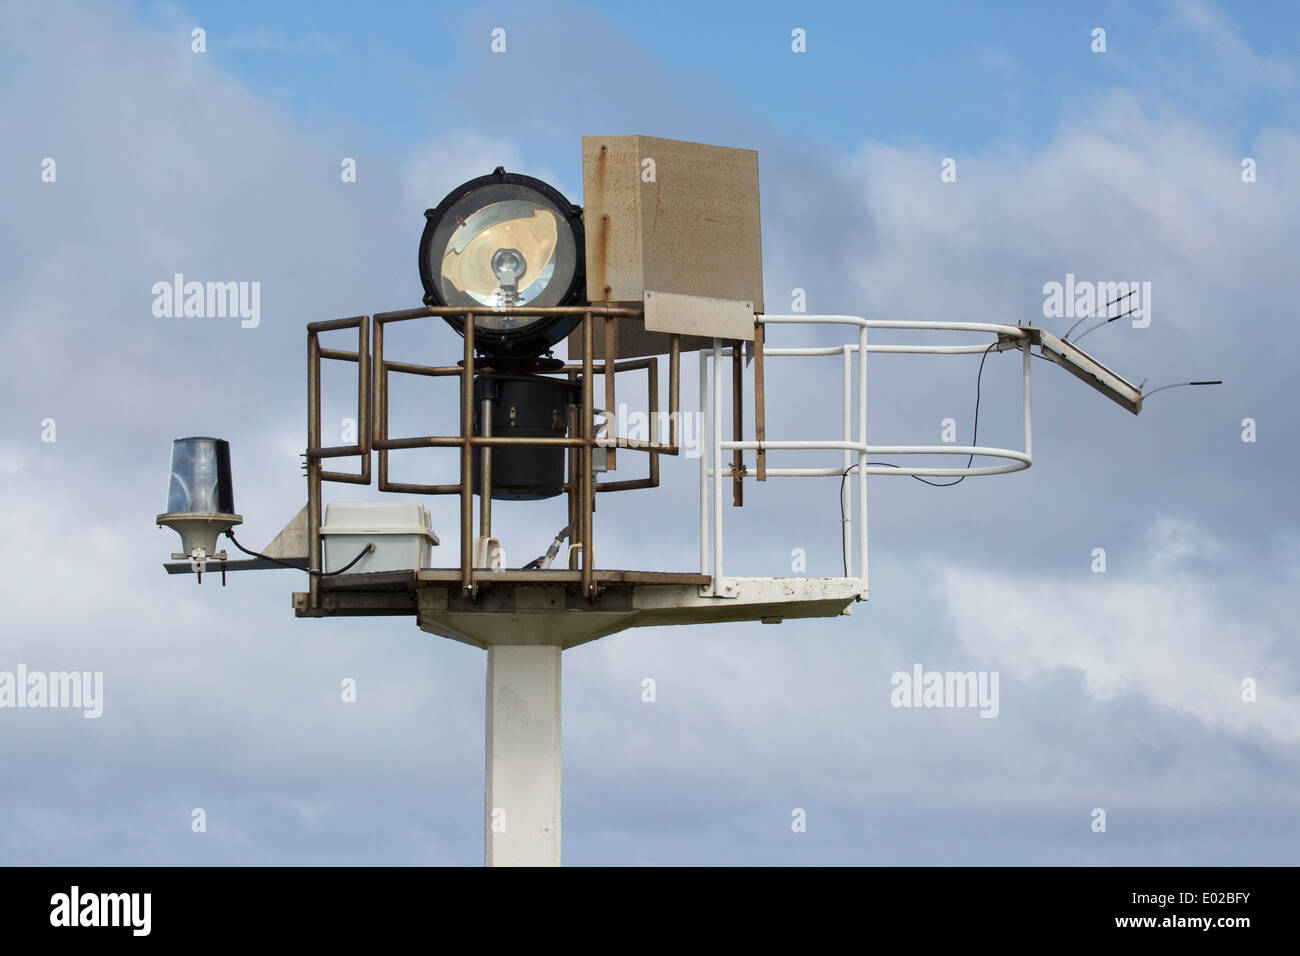 Kilauea automatic rotating beacon provides light for navigators. - Stock Image